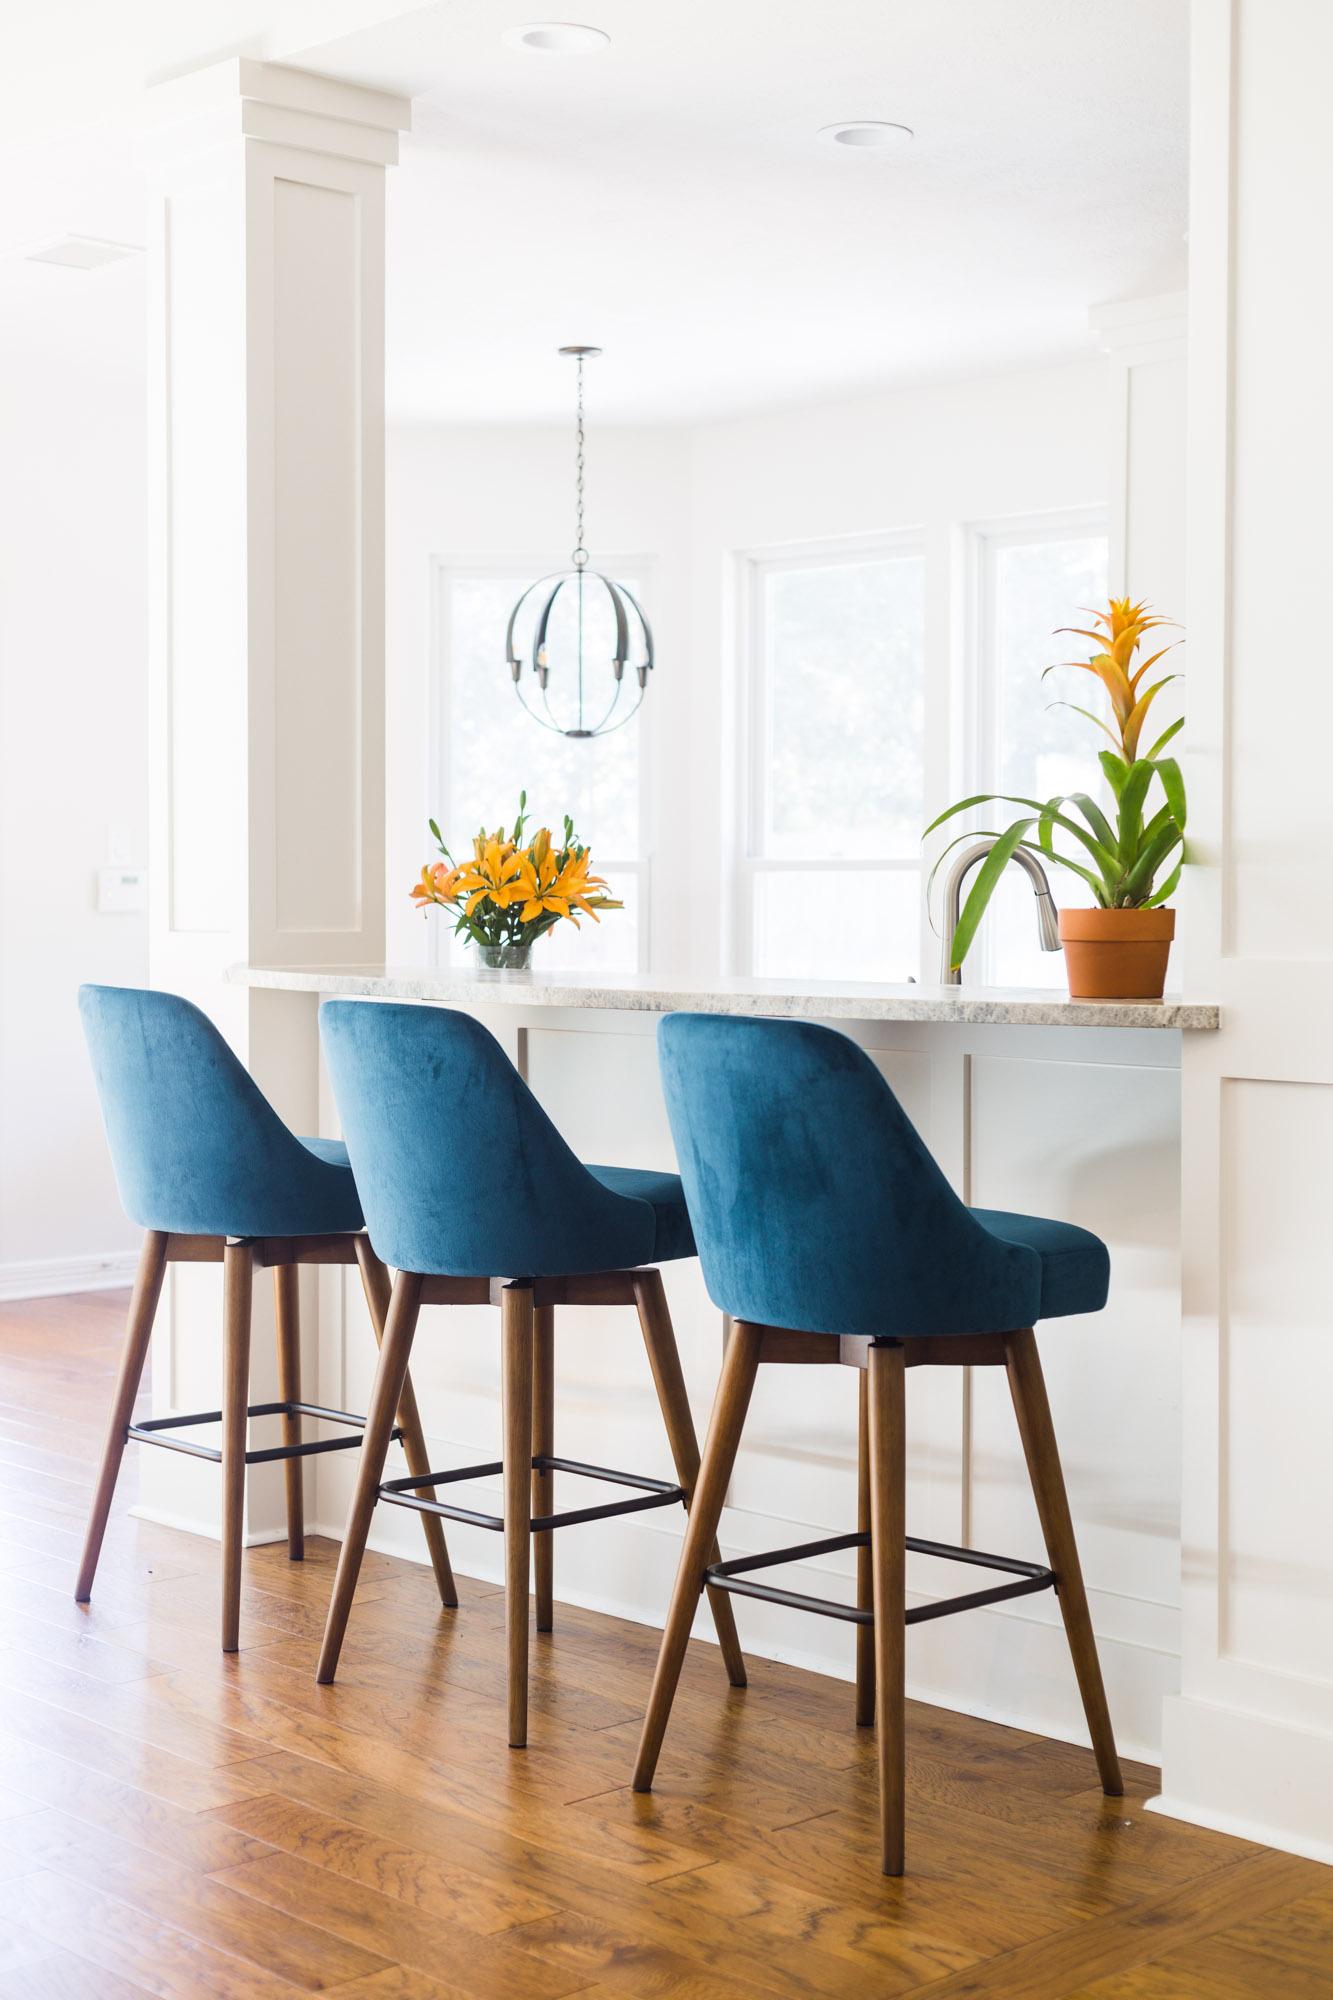 Mid century modern bar stools with white paneling at kitchen bar, kitchen remodel, Designer: Carla Aston